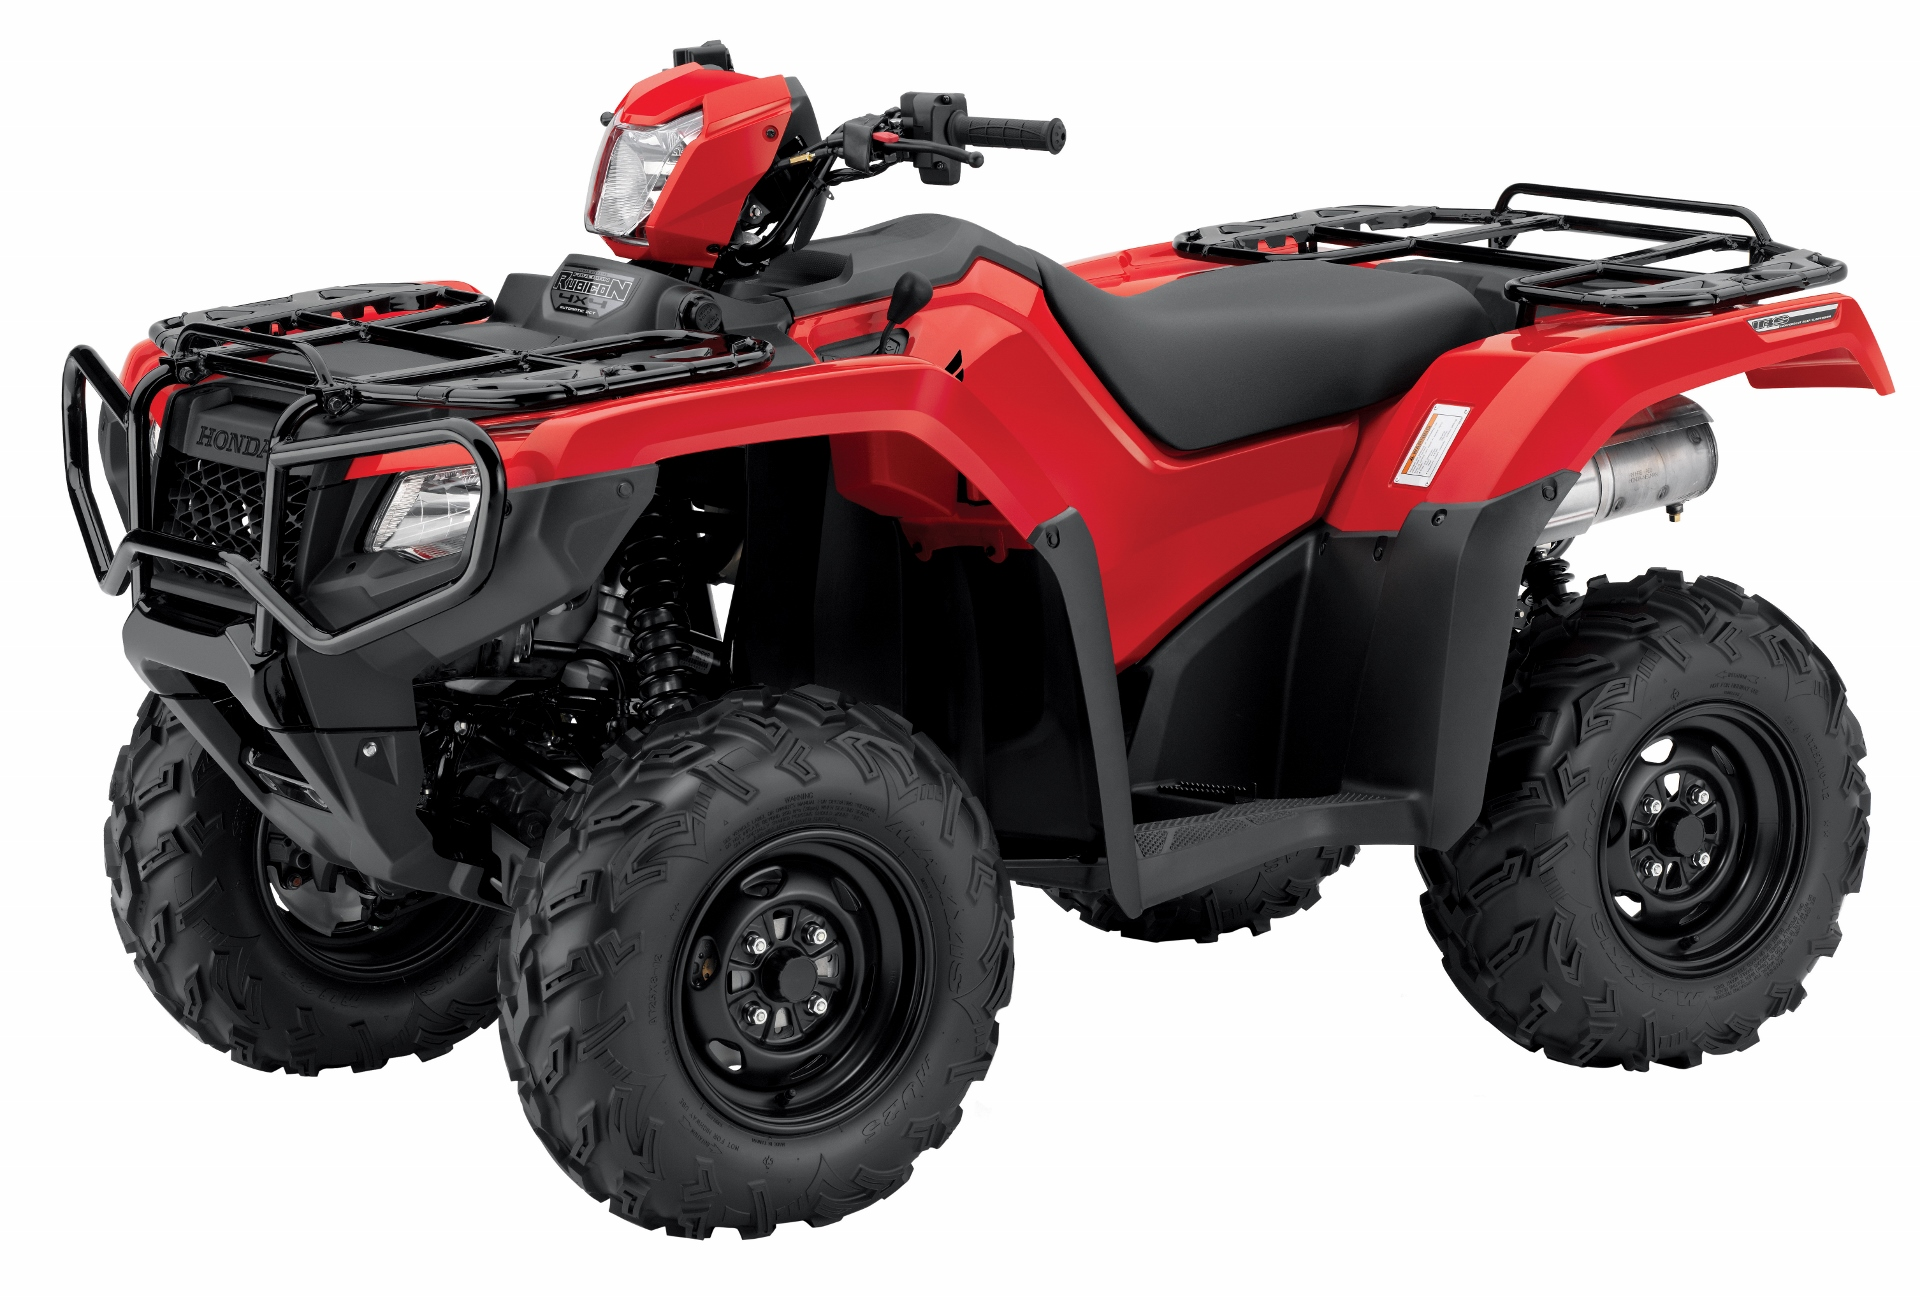 2018 Honda Rubicon DCT / EPS ATV Review of Specs - TRX500FA6